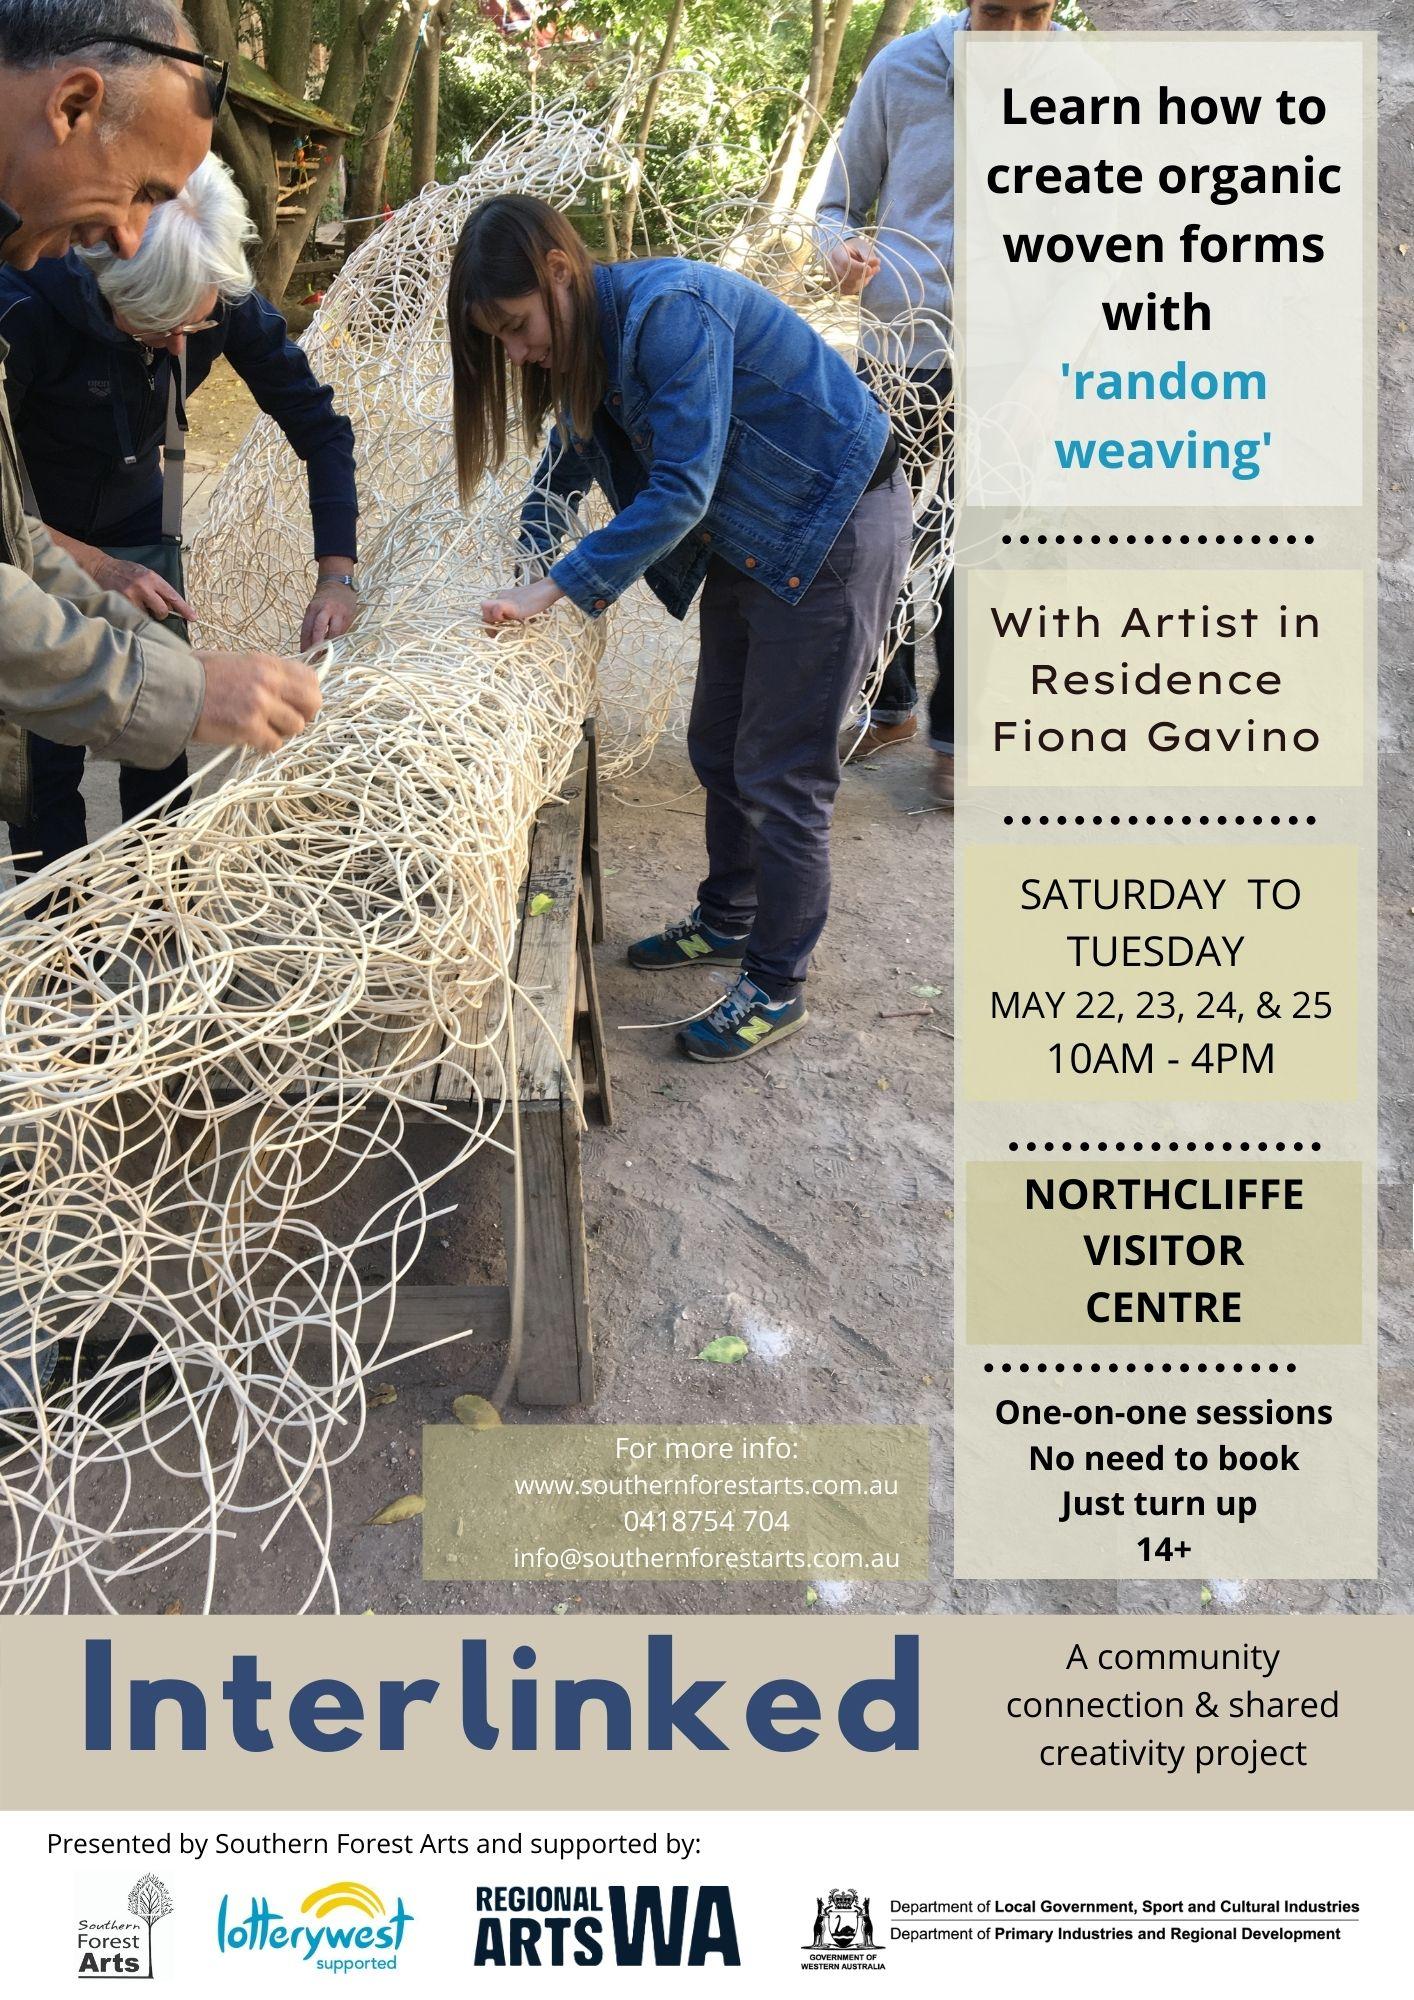 Interlinked Project - Random Weaving with Fiona Gavino